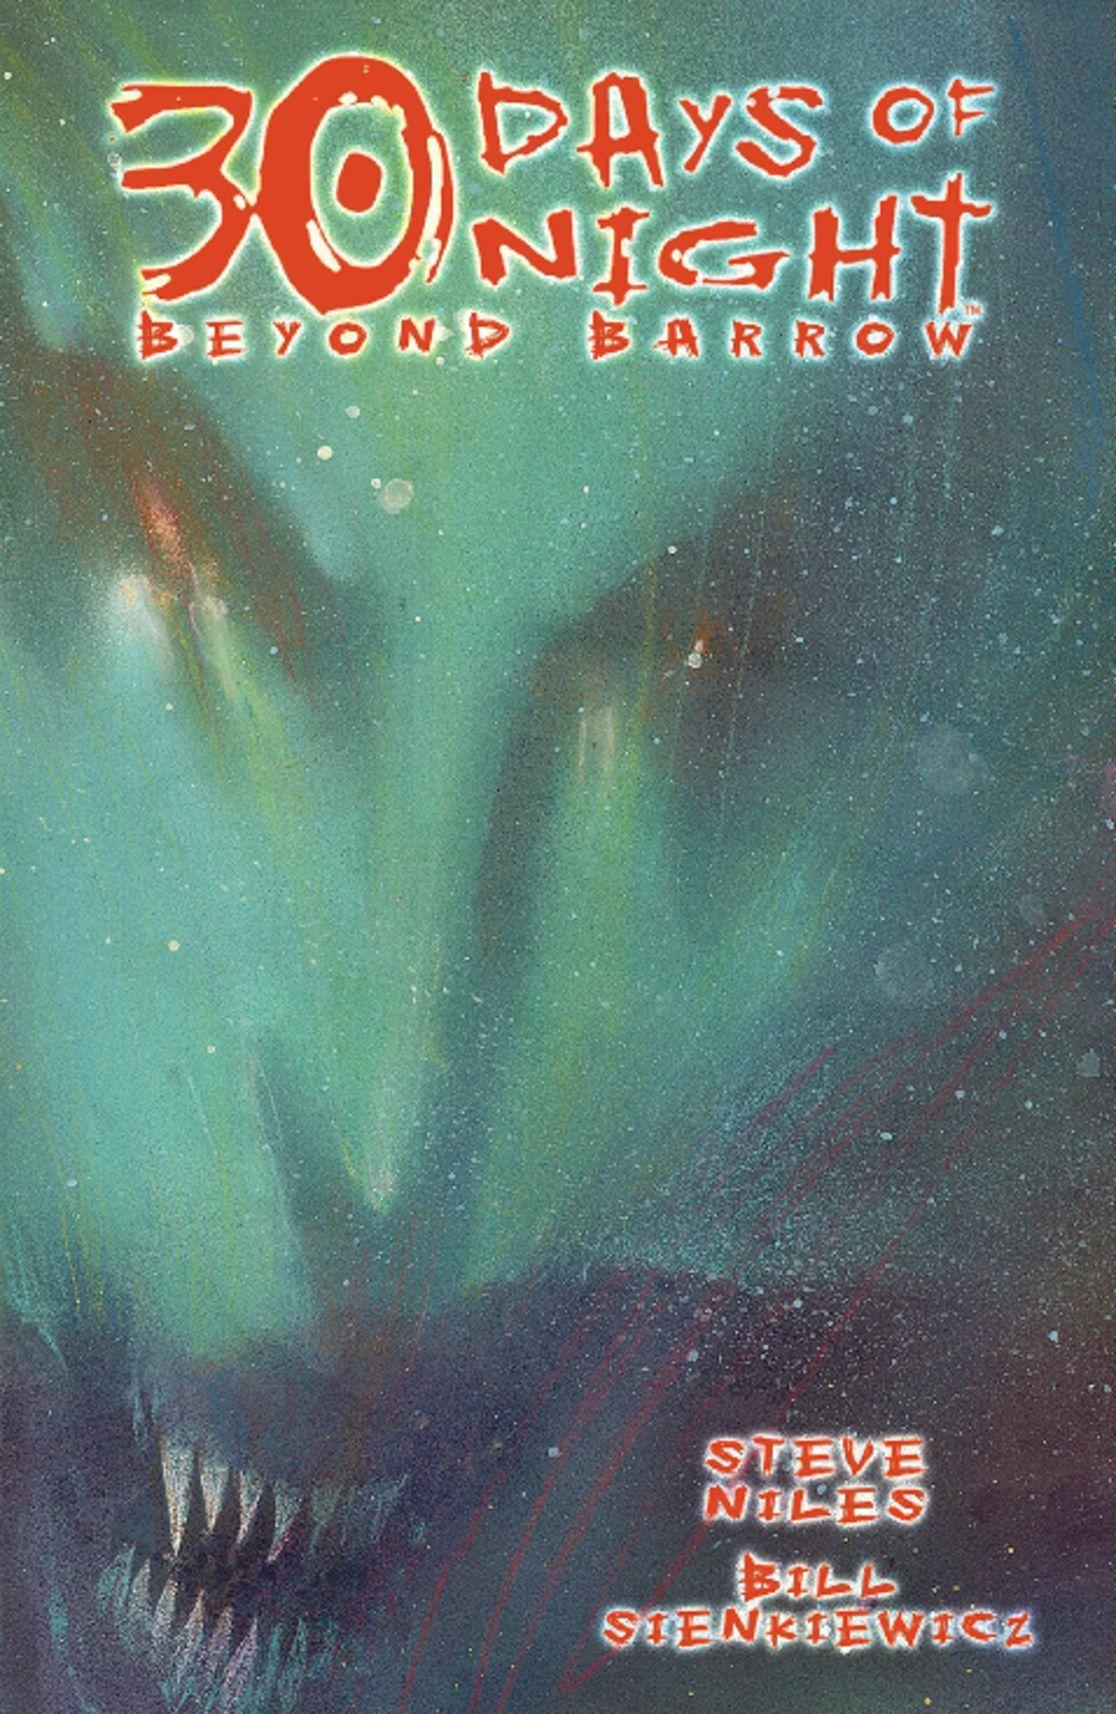 30 Days of Night Beyond Barrow Digital